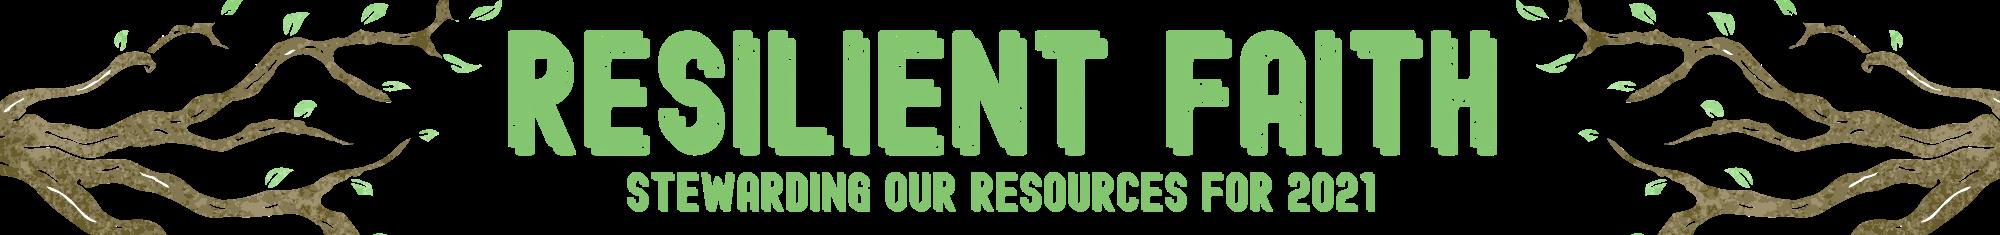 Resilient-Faith-Letter-Header-2